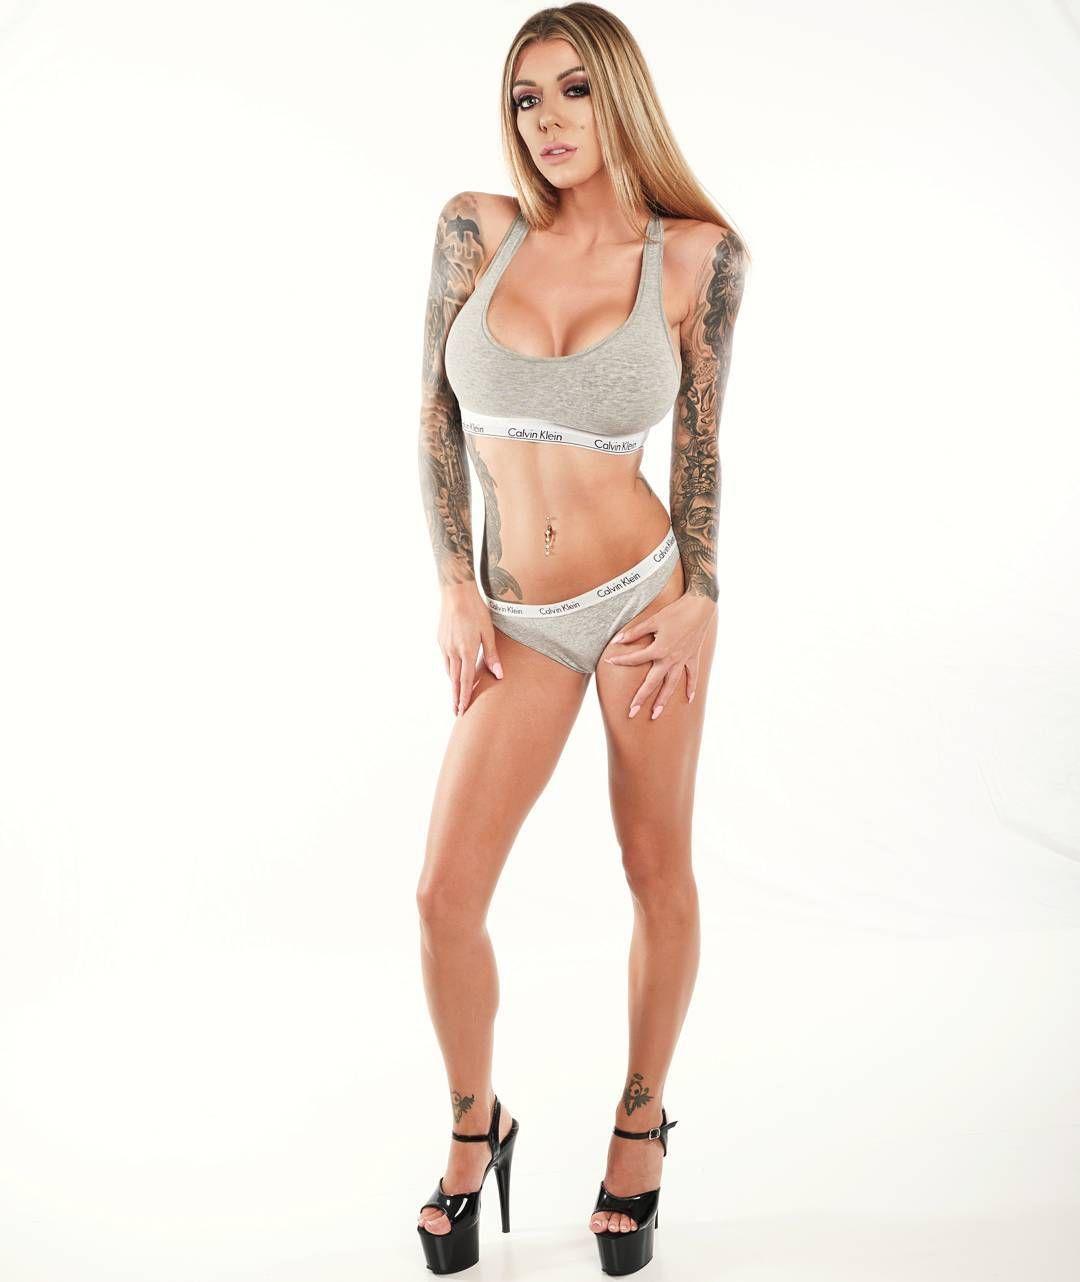 Young Karma Rx nude photos 2019